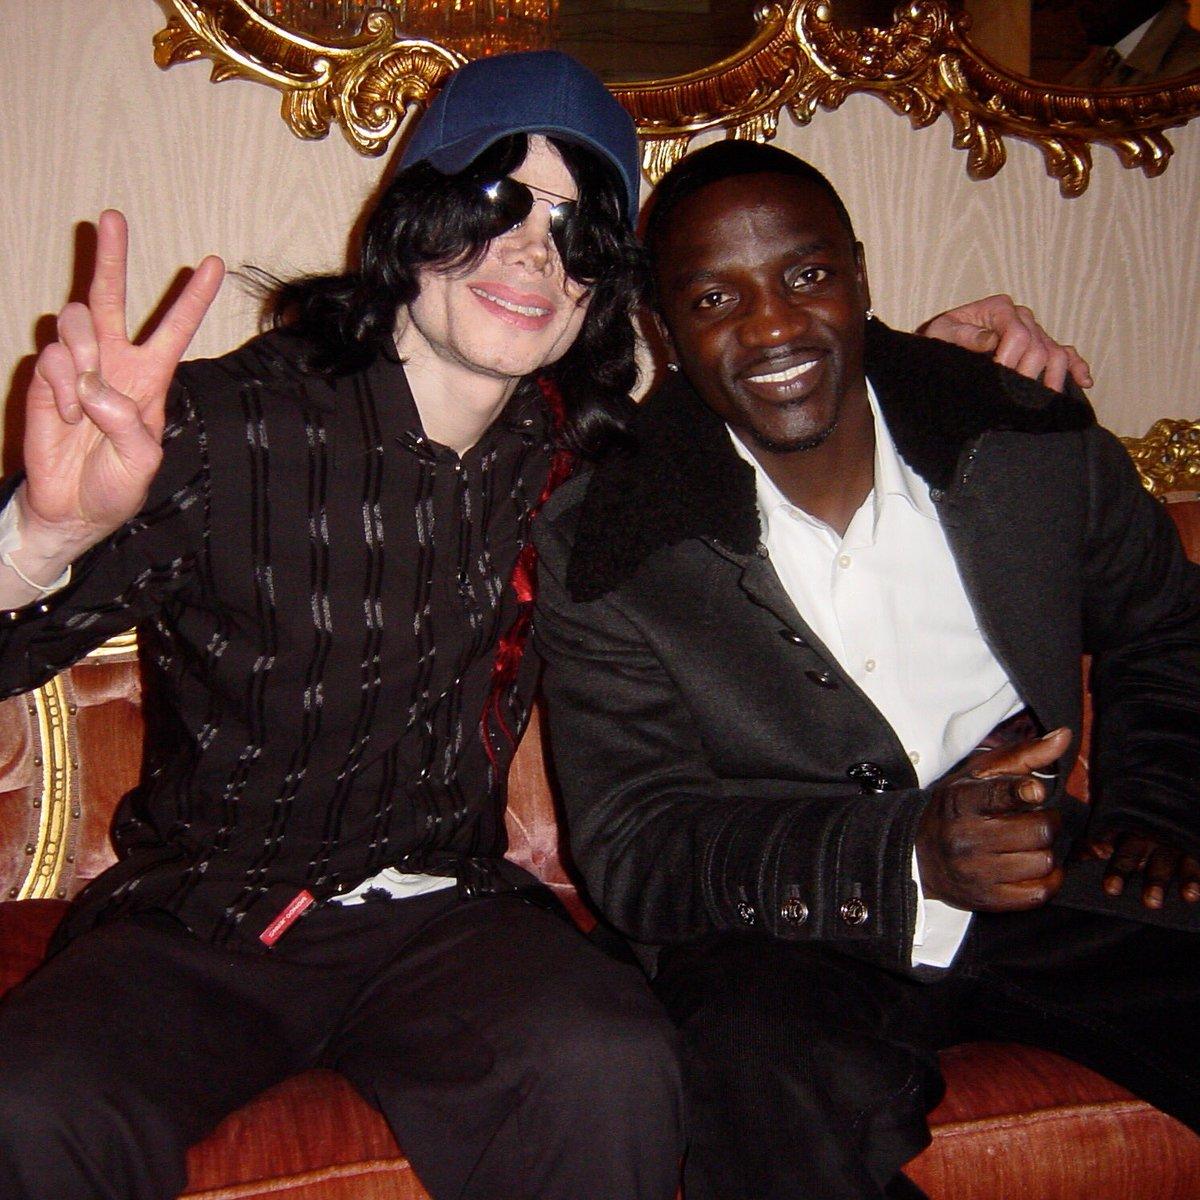 Happy Birthday MJ miss you! #KingOfPop @michaeljackson https://t.co/3RfIux73or